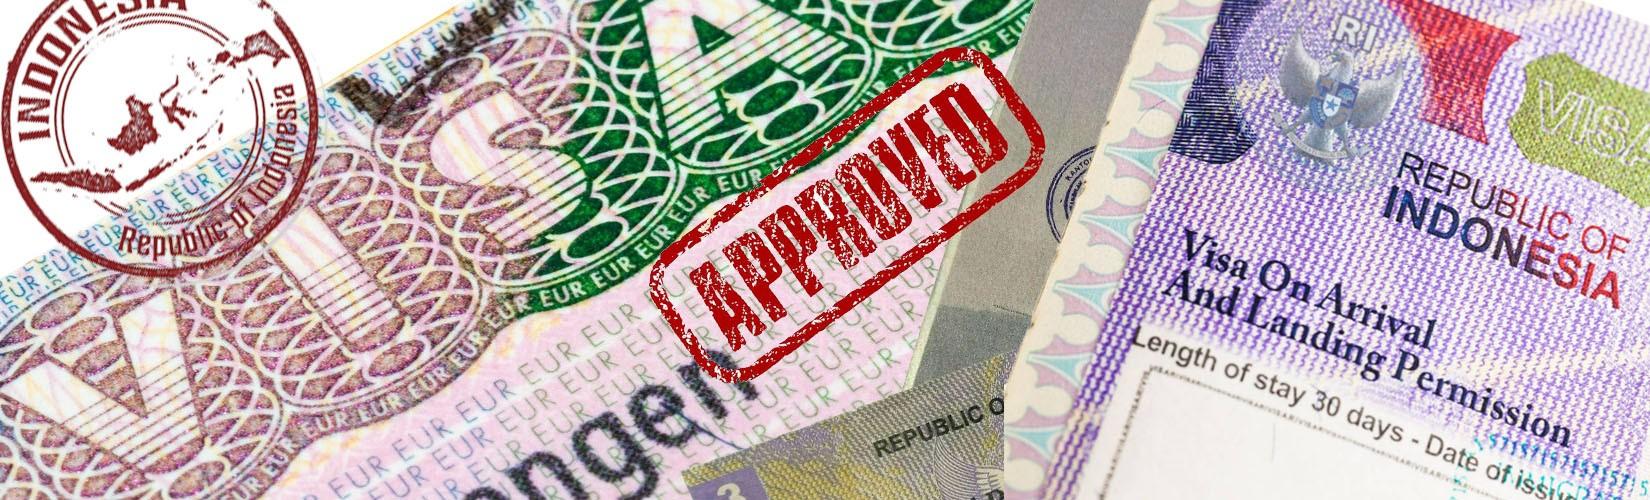 Indonesia Travel Info: Complete Indonesia Tourist Visa Information